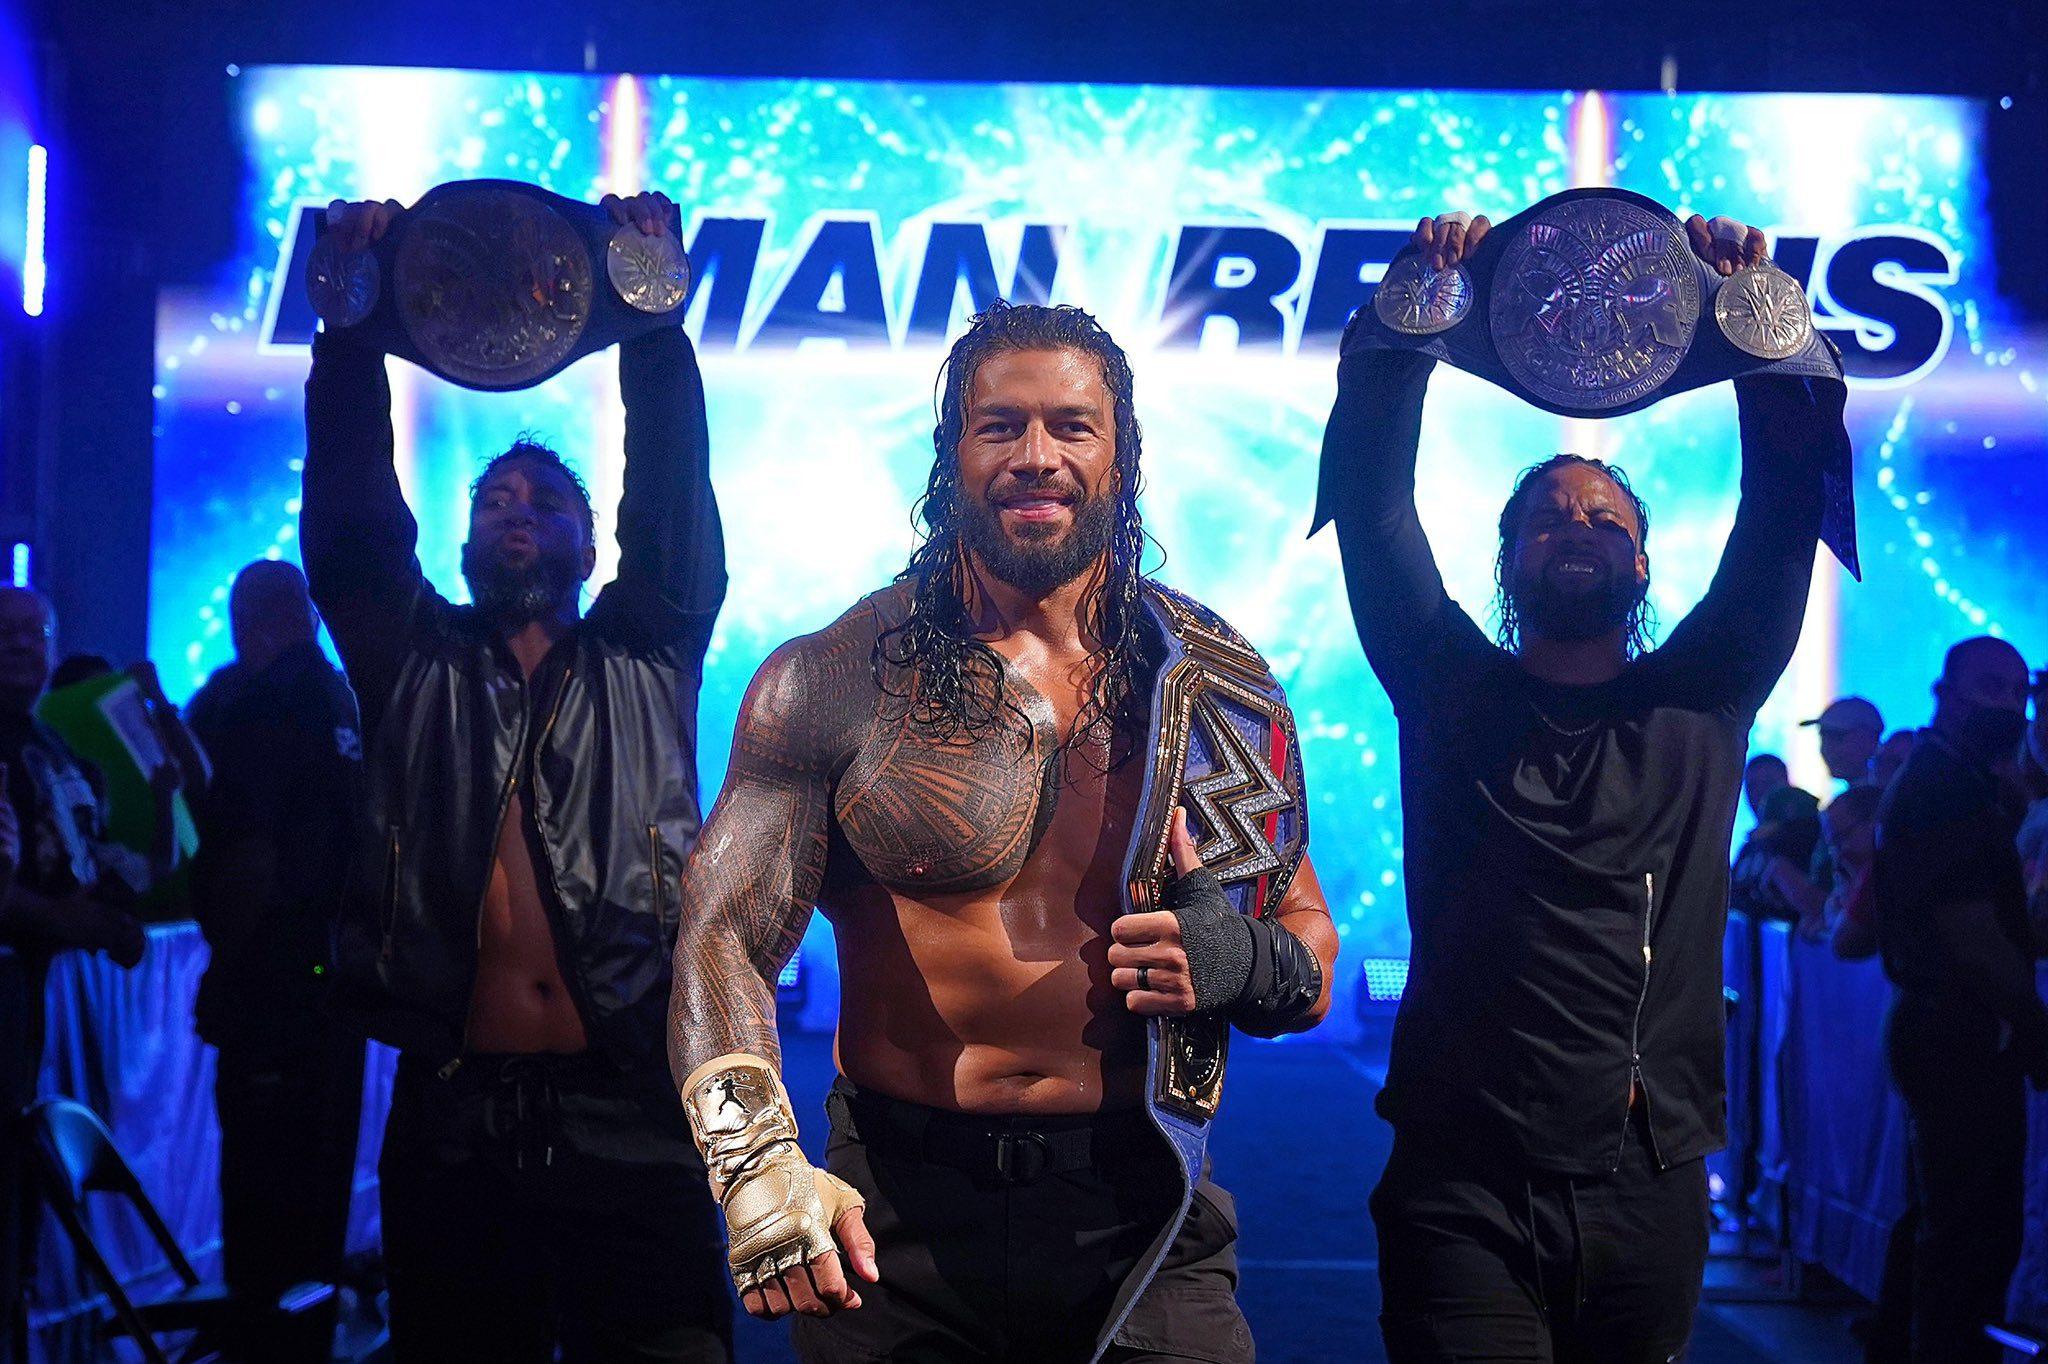 Cobertura: WWE SuperShow in Milwalkee (31/07/2021) – Mais uma vez!